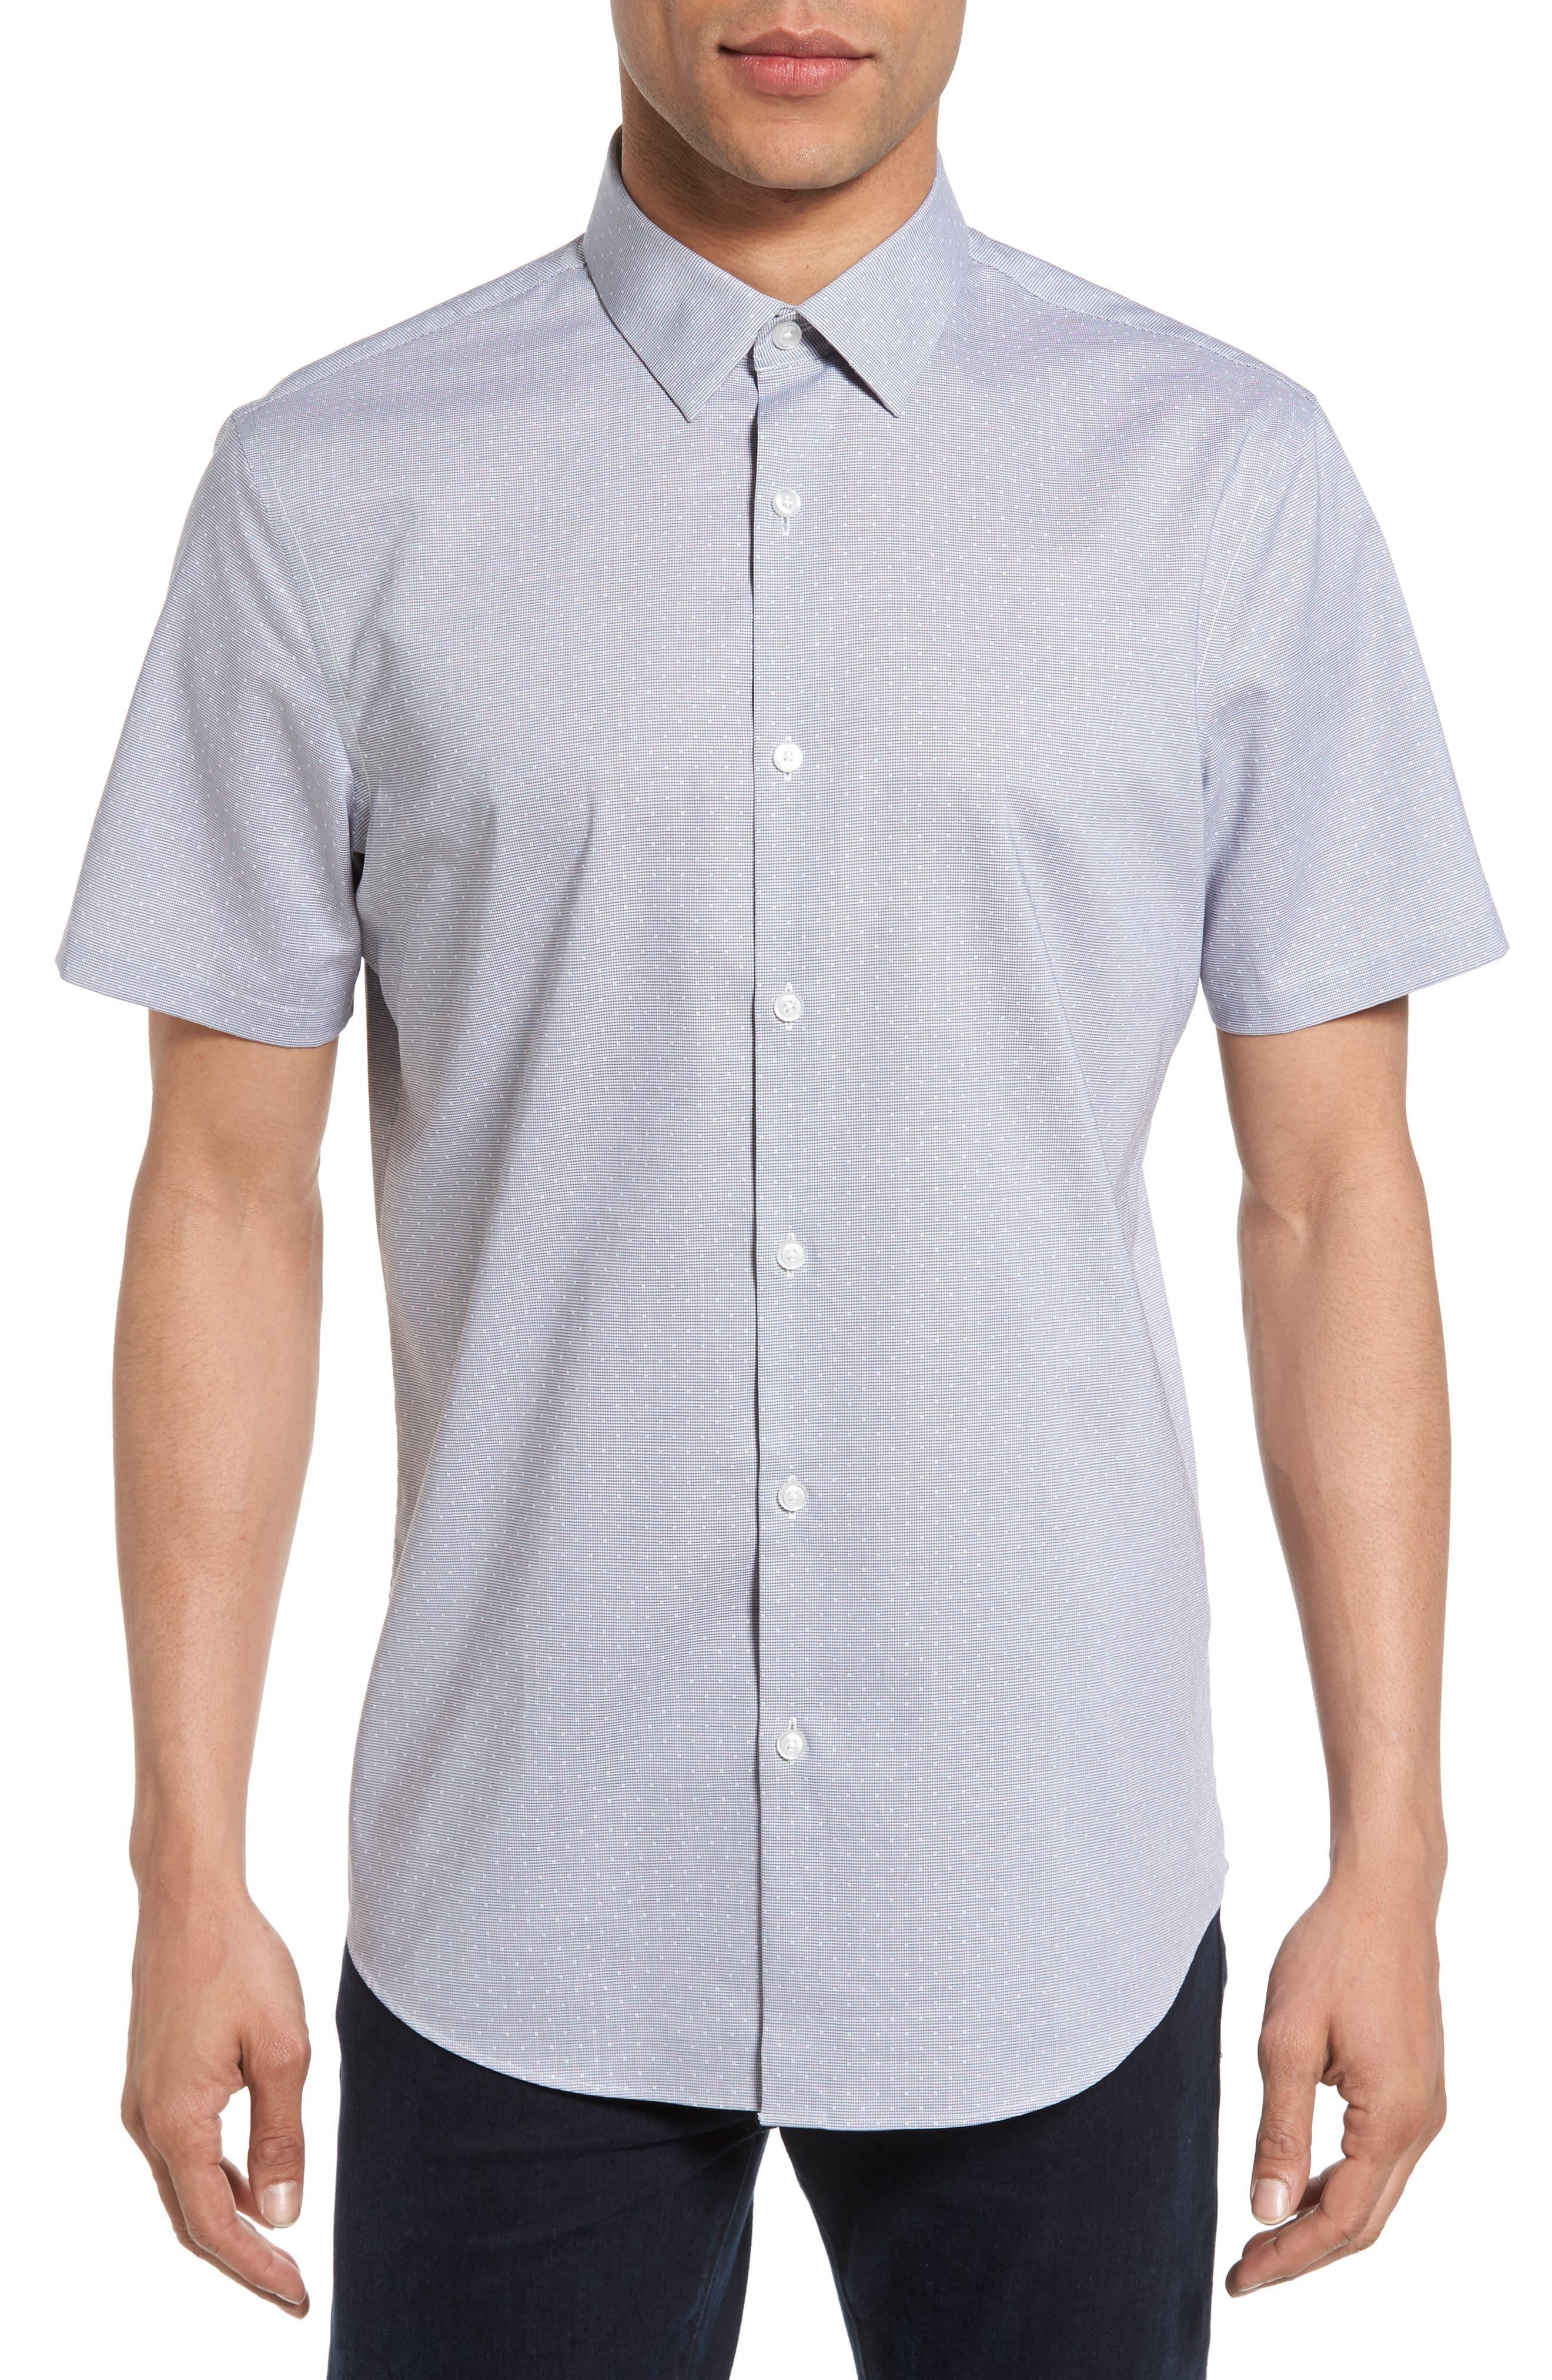 Calibrate No-Iron Dot Jacquard Woven Shirt